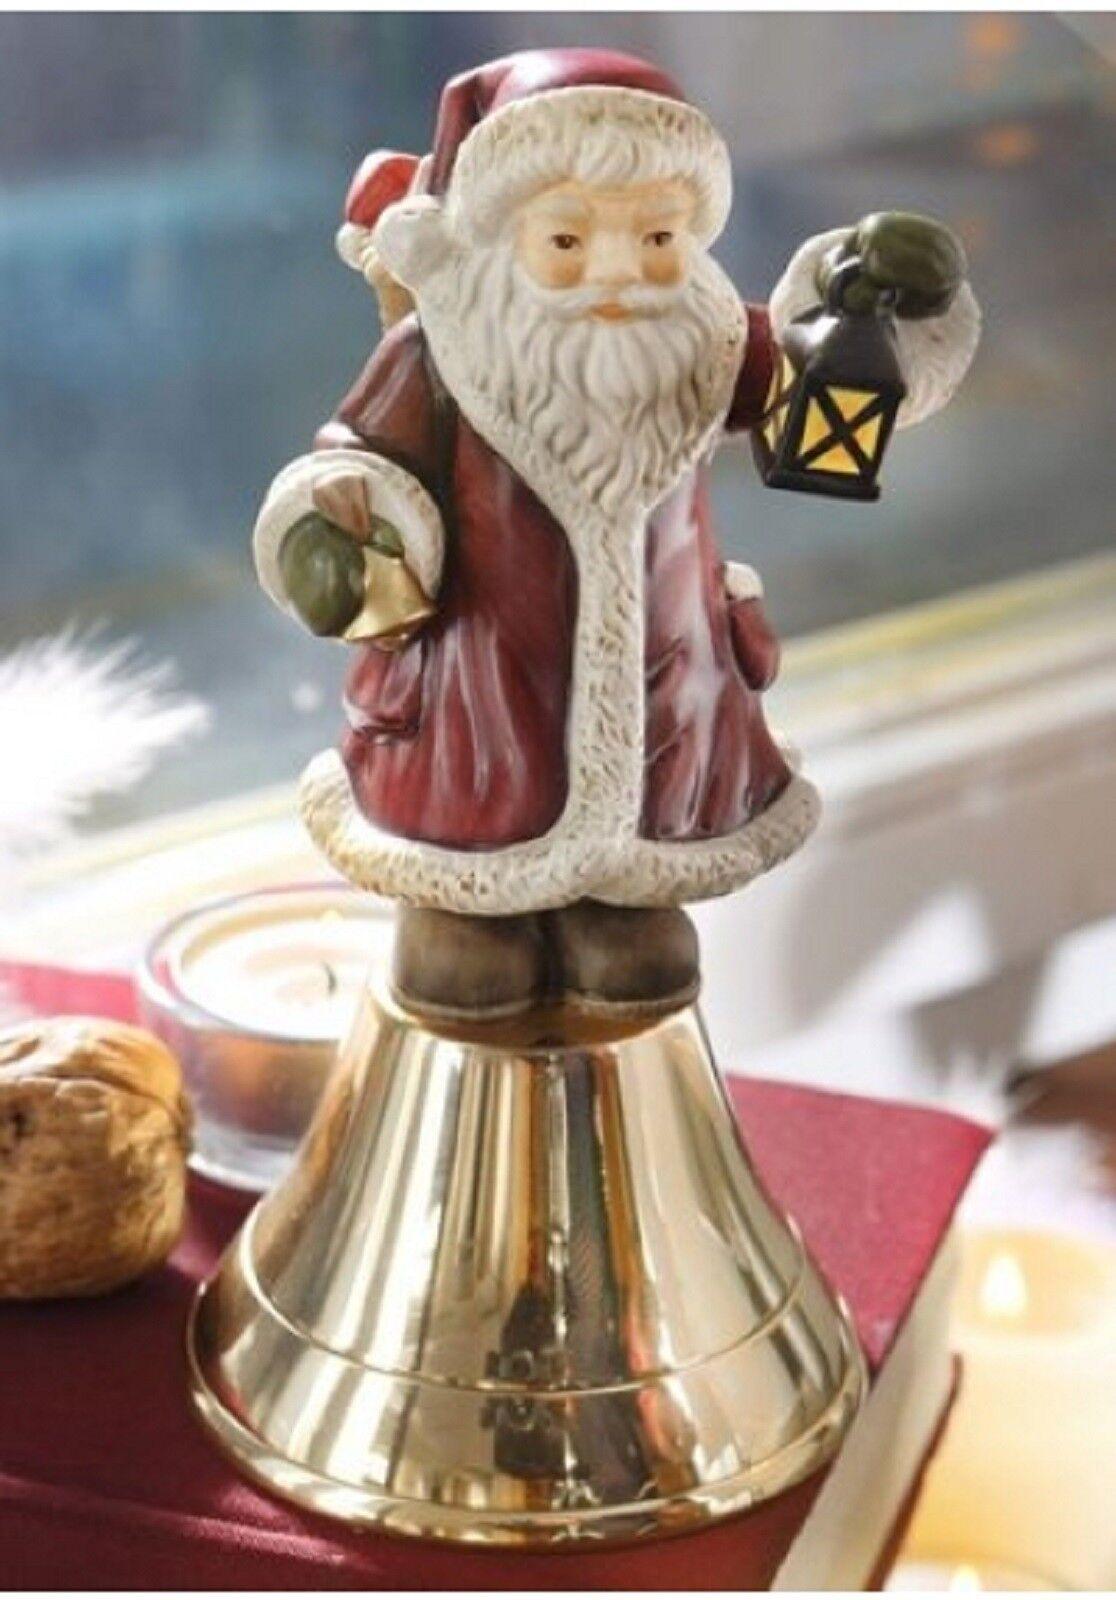 Goebel CAMPANA CAMPANA CAMPANA Babbo Natale, Babbo Natale, Natale Campana, Landhaus NUOVO 99b7b7